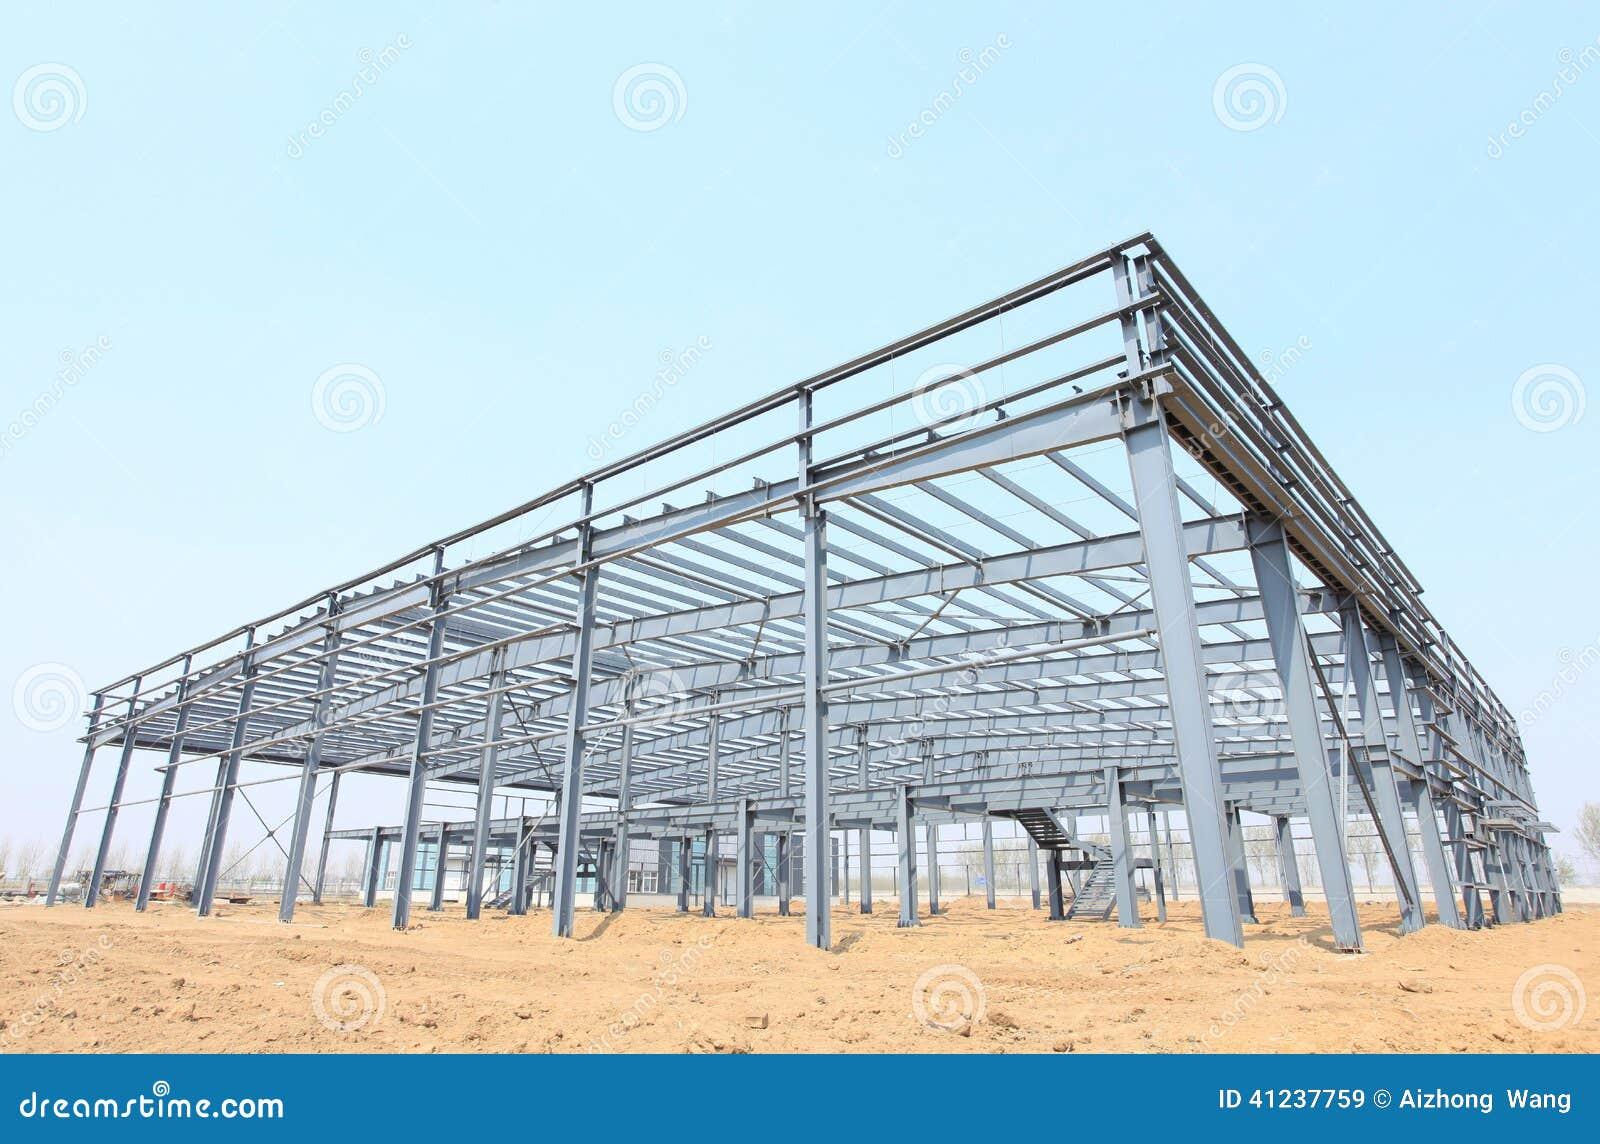 Stahlrahmenkonstruktion stockbild. Bild von unfertig - 41237759